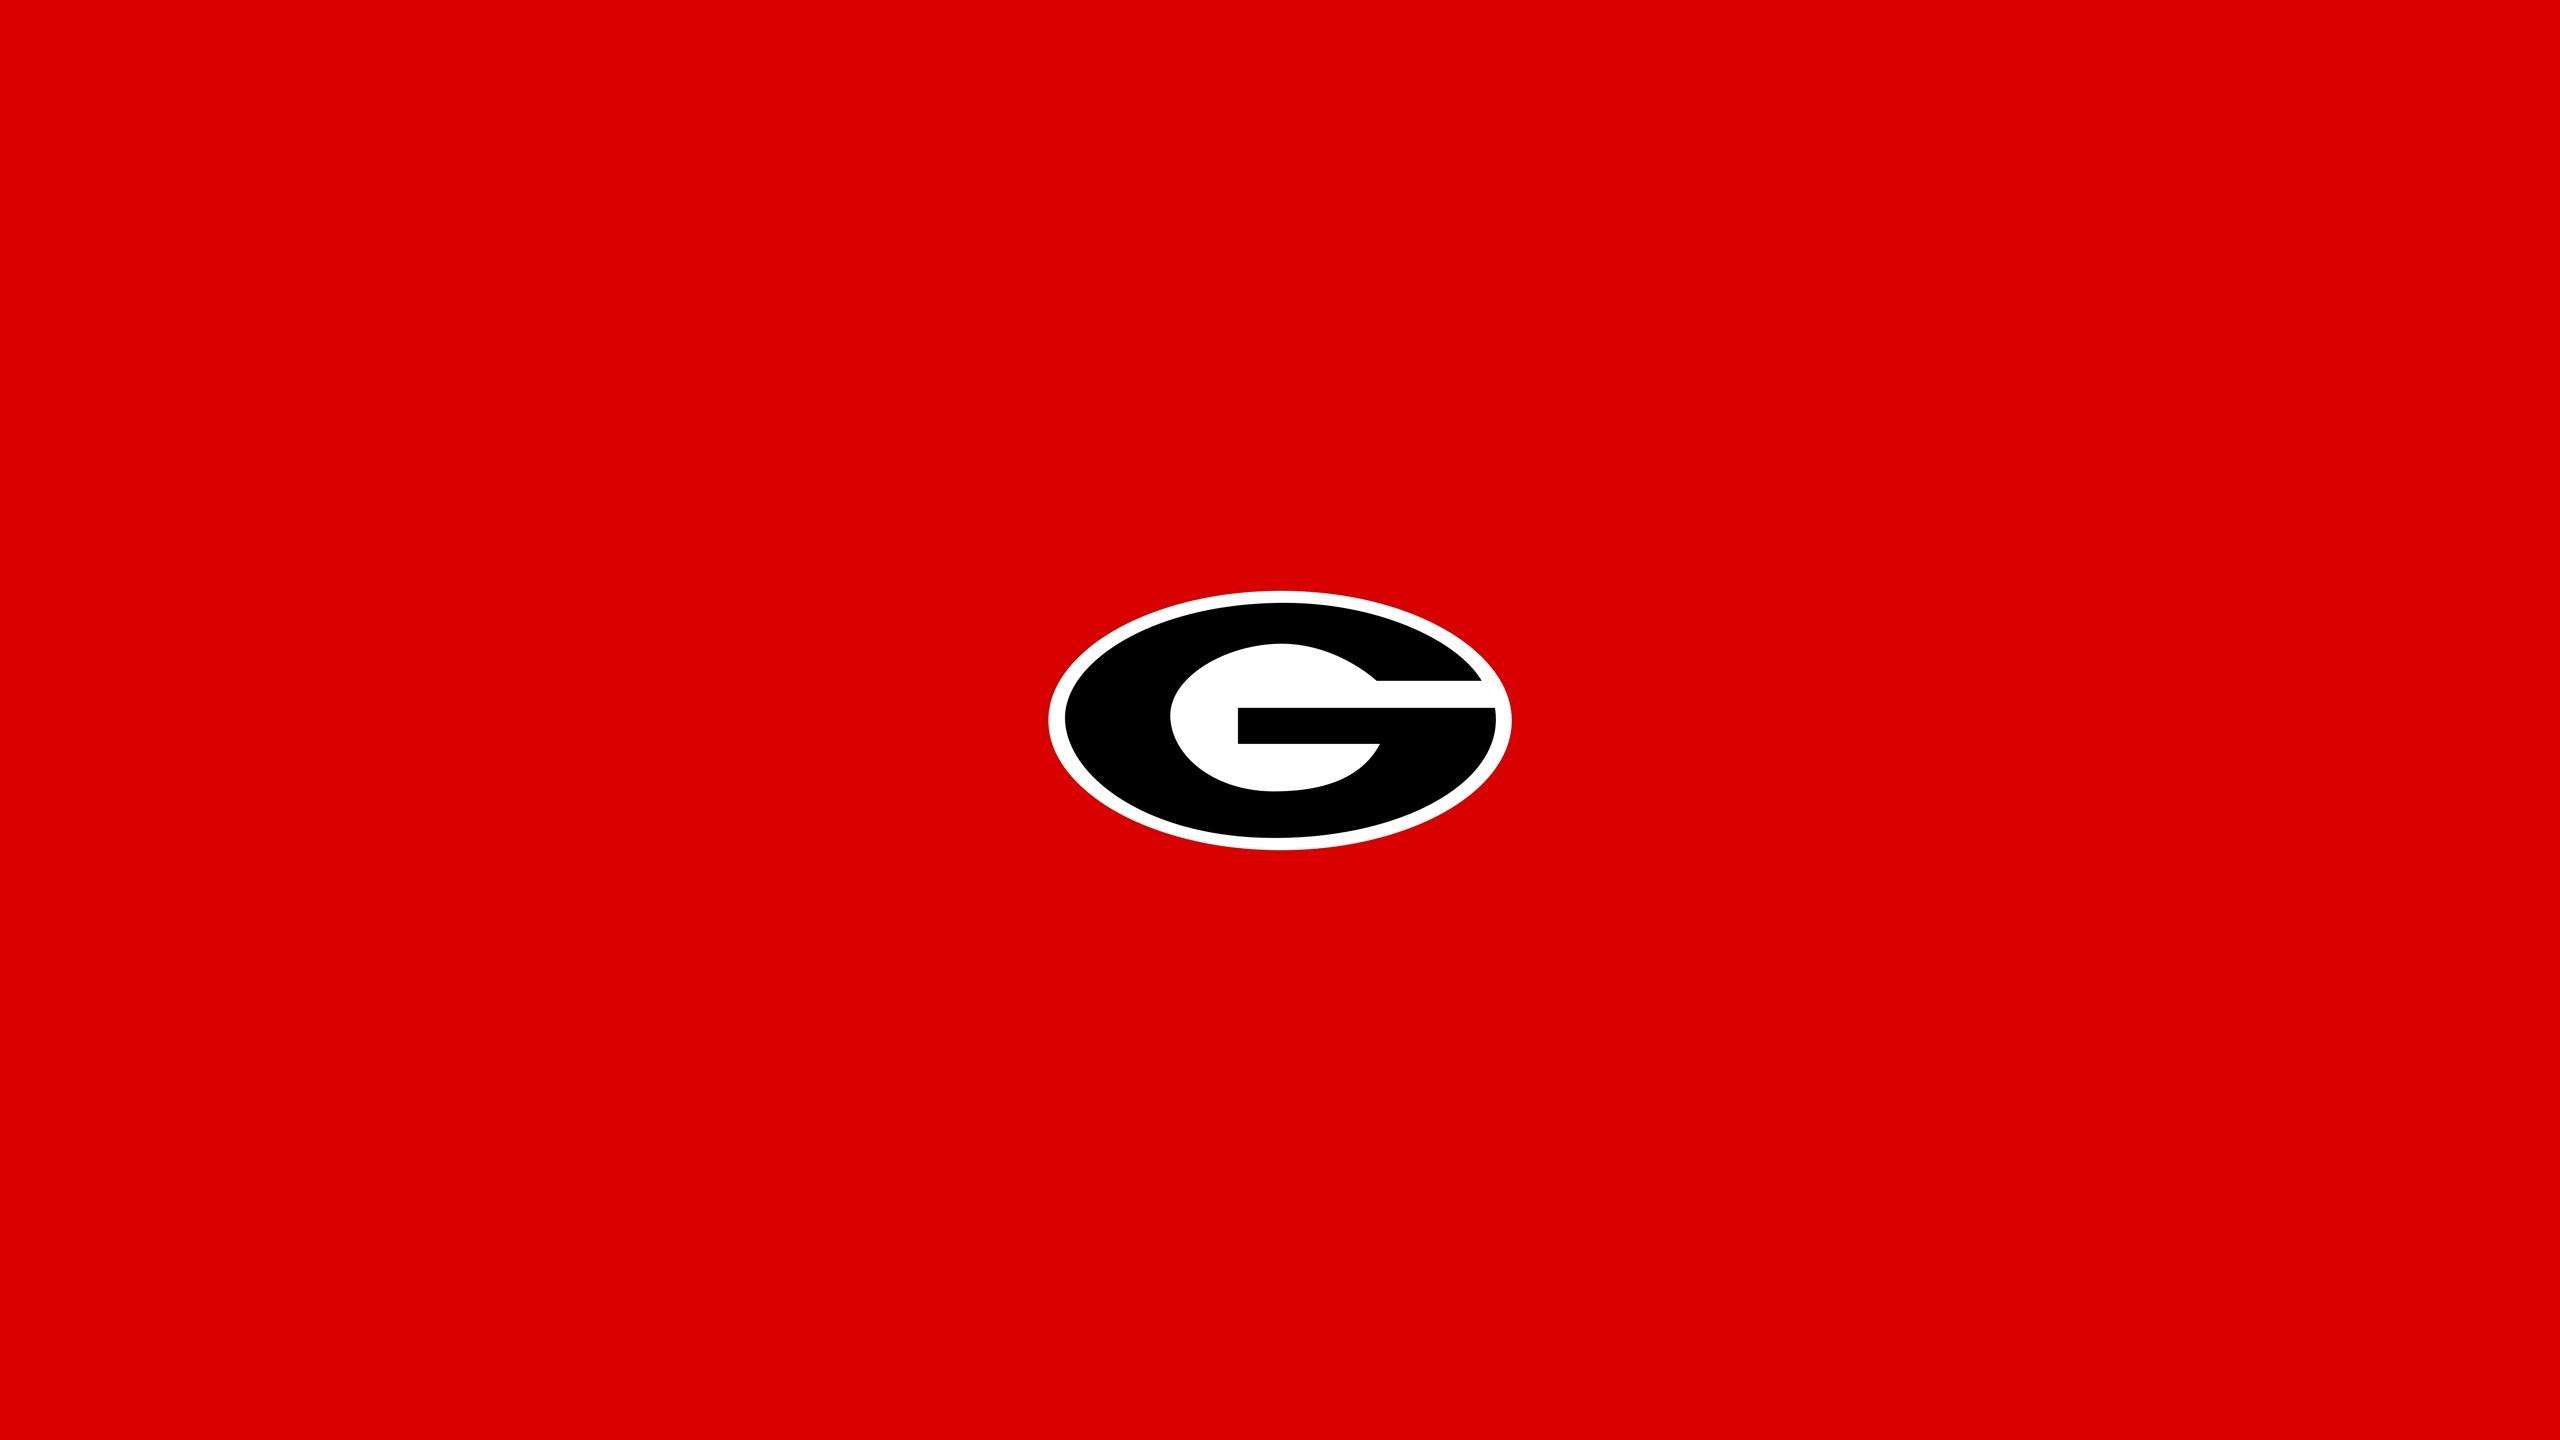 2560x1440 GEORGIA BULLDOGS College Football Wallpaper 2560A 1440 Georgia Bulldogs 22 Wallpapers